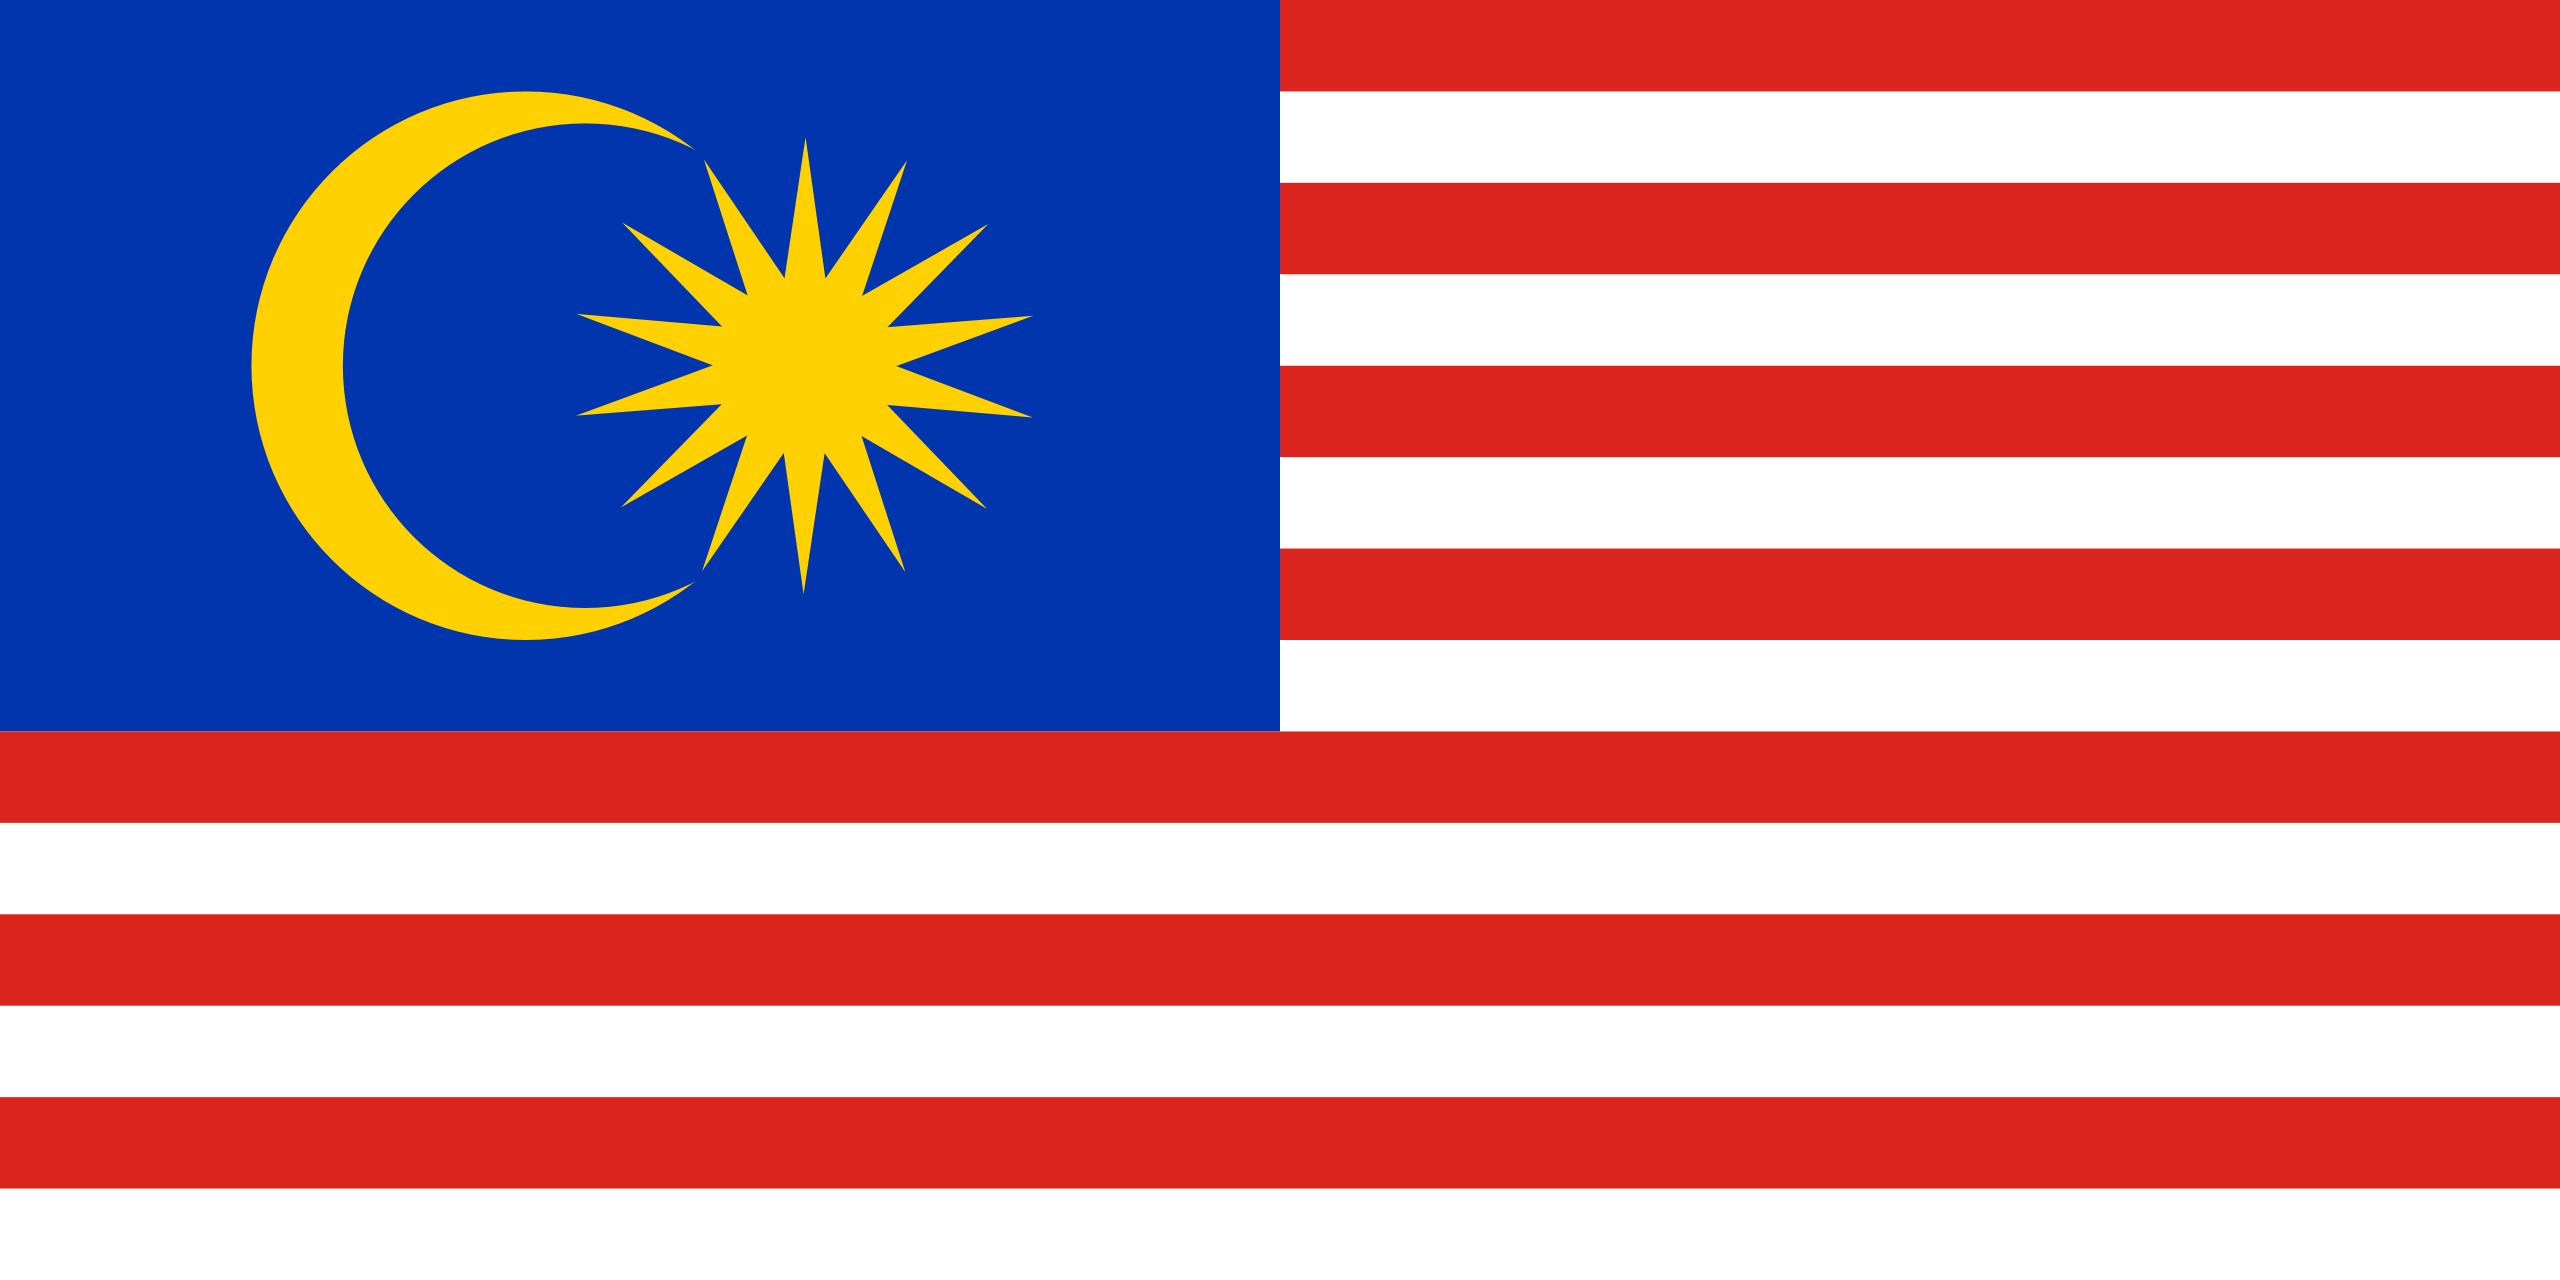 malasia, 国家, 会徽, 徽标, 符号 - 高清壁纸 - 教授-falken.com